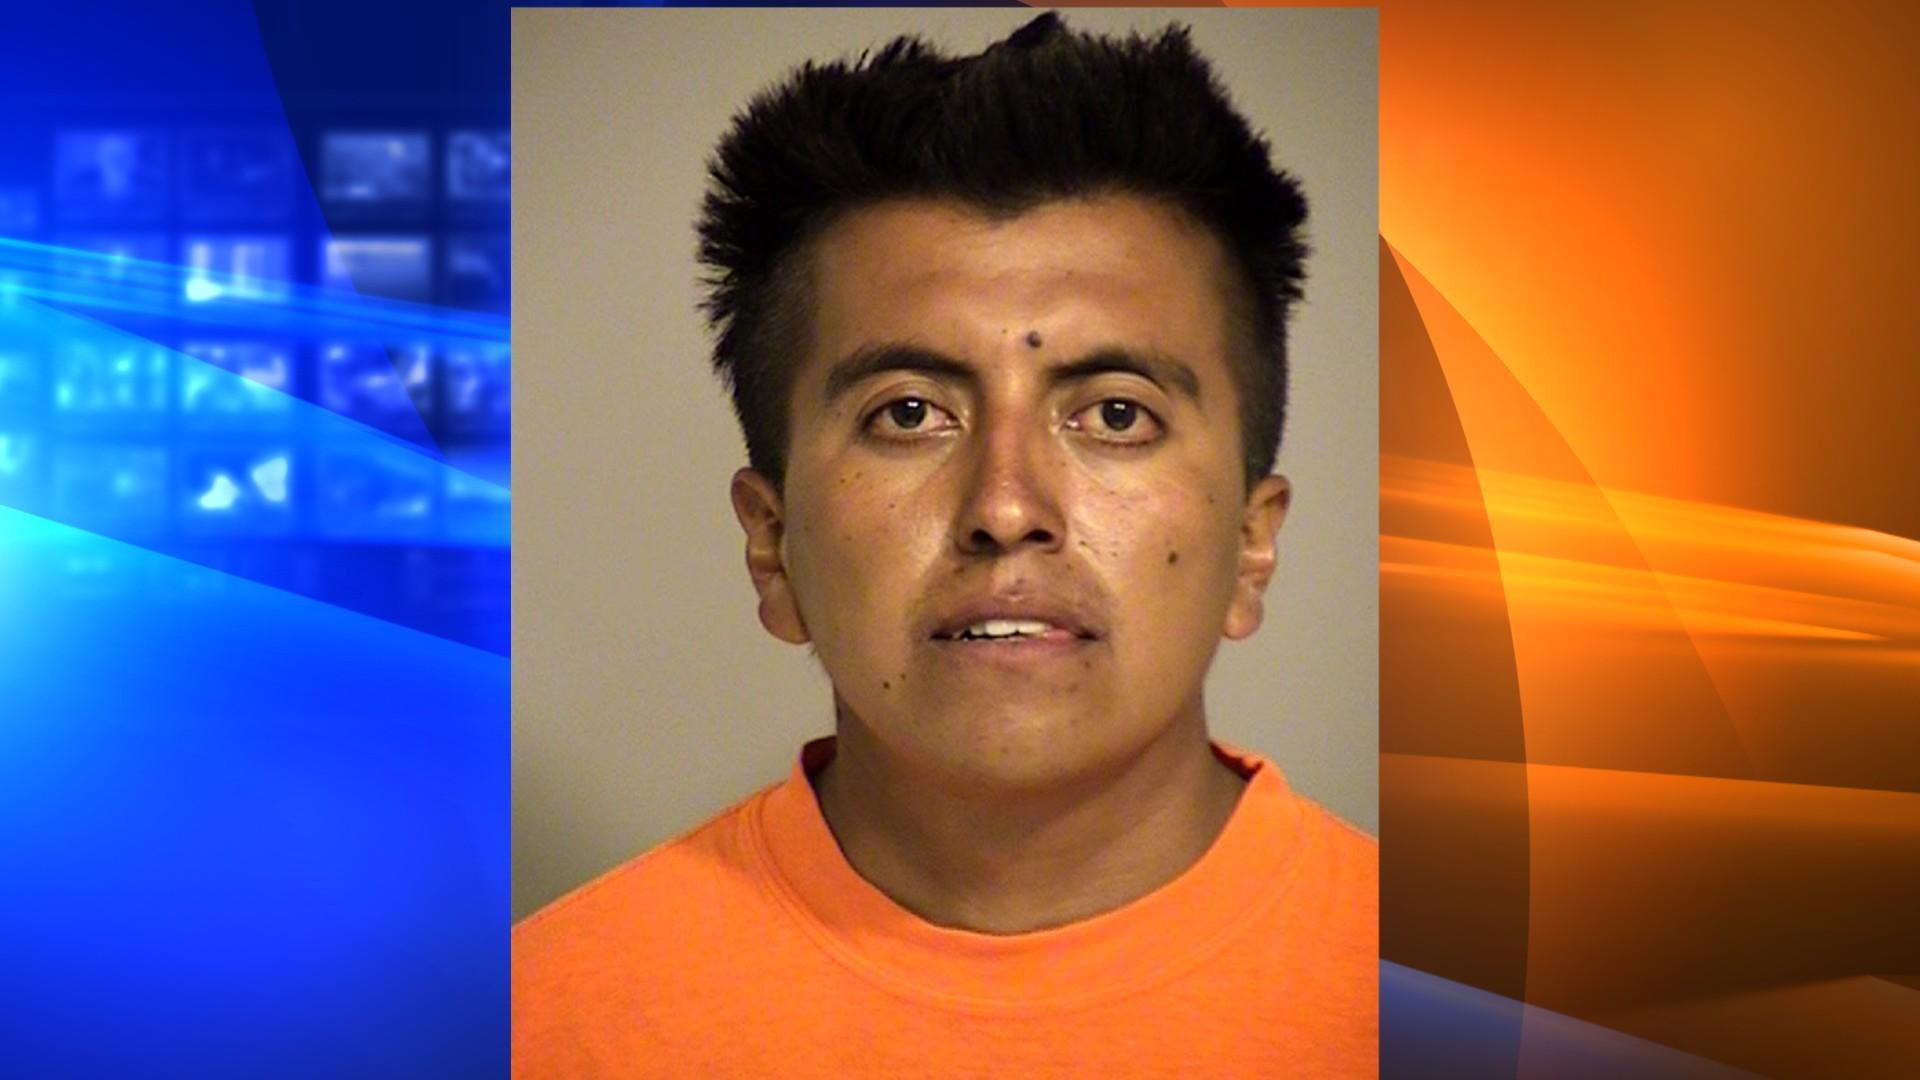 Gustavo Martinez Ramirez, 25, isseenin abooking photoreleased by the Ventura County Sheriff's Office on June 21, 2021.